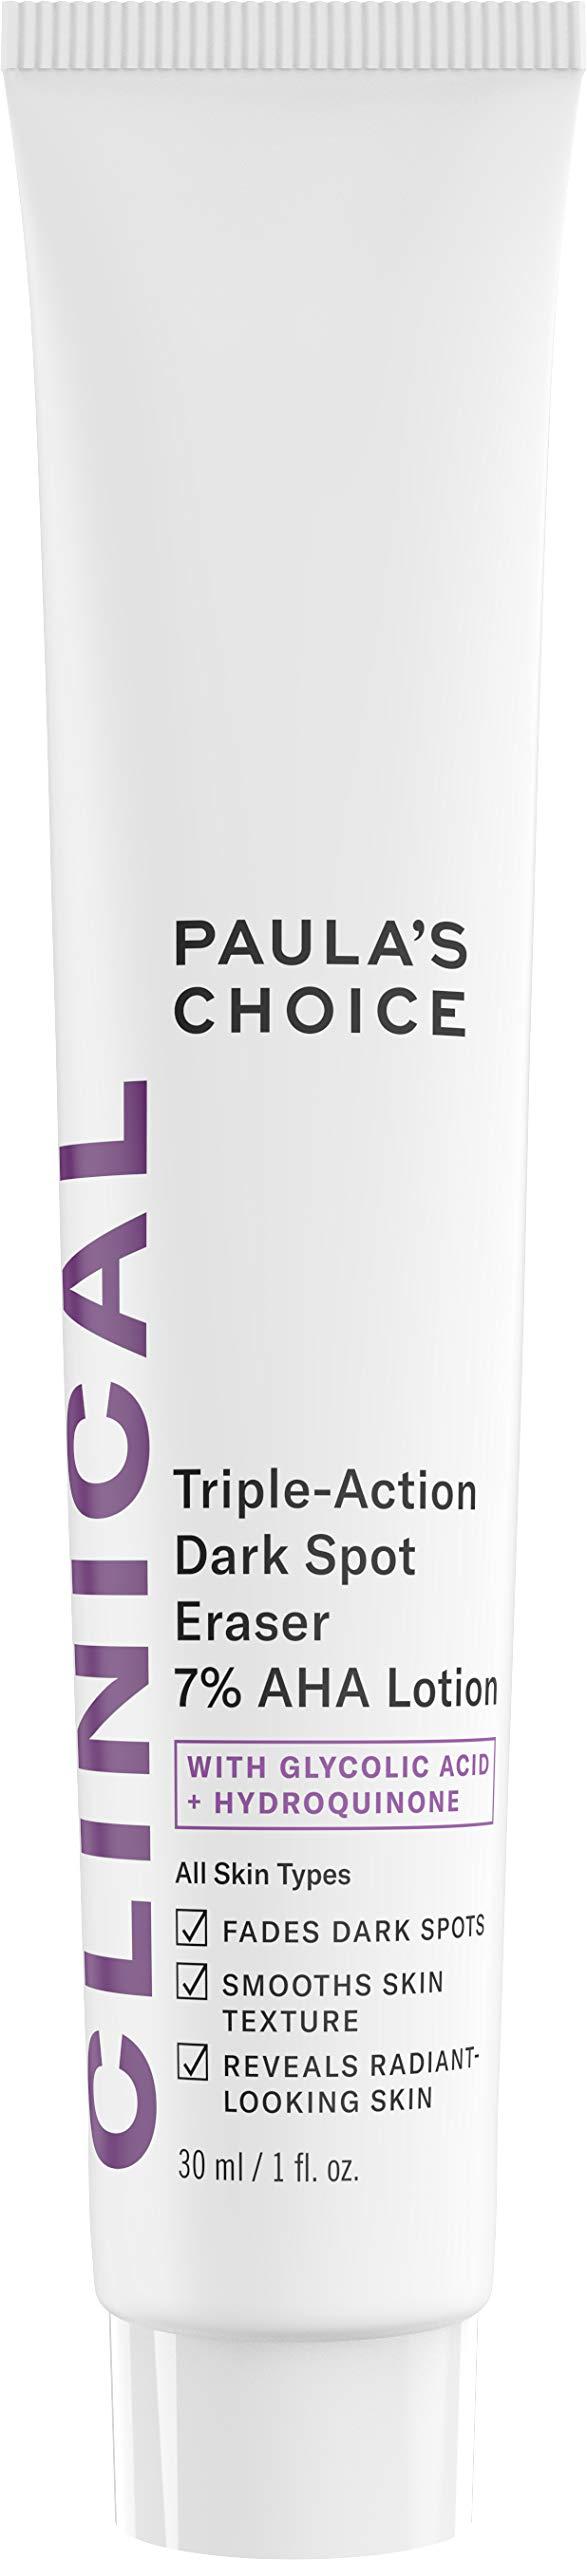 Paula's Choice CLINICAL Triple-Action Dark Spot Eraser 7% AHA Lotion, Glycolic Acid & Hydroquinone, Hyperpigmentation & Skin Lightening Cream, 1 Ounce by PAULA'S CHOICE